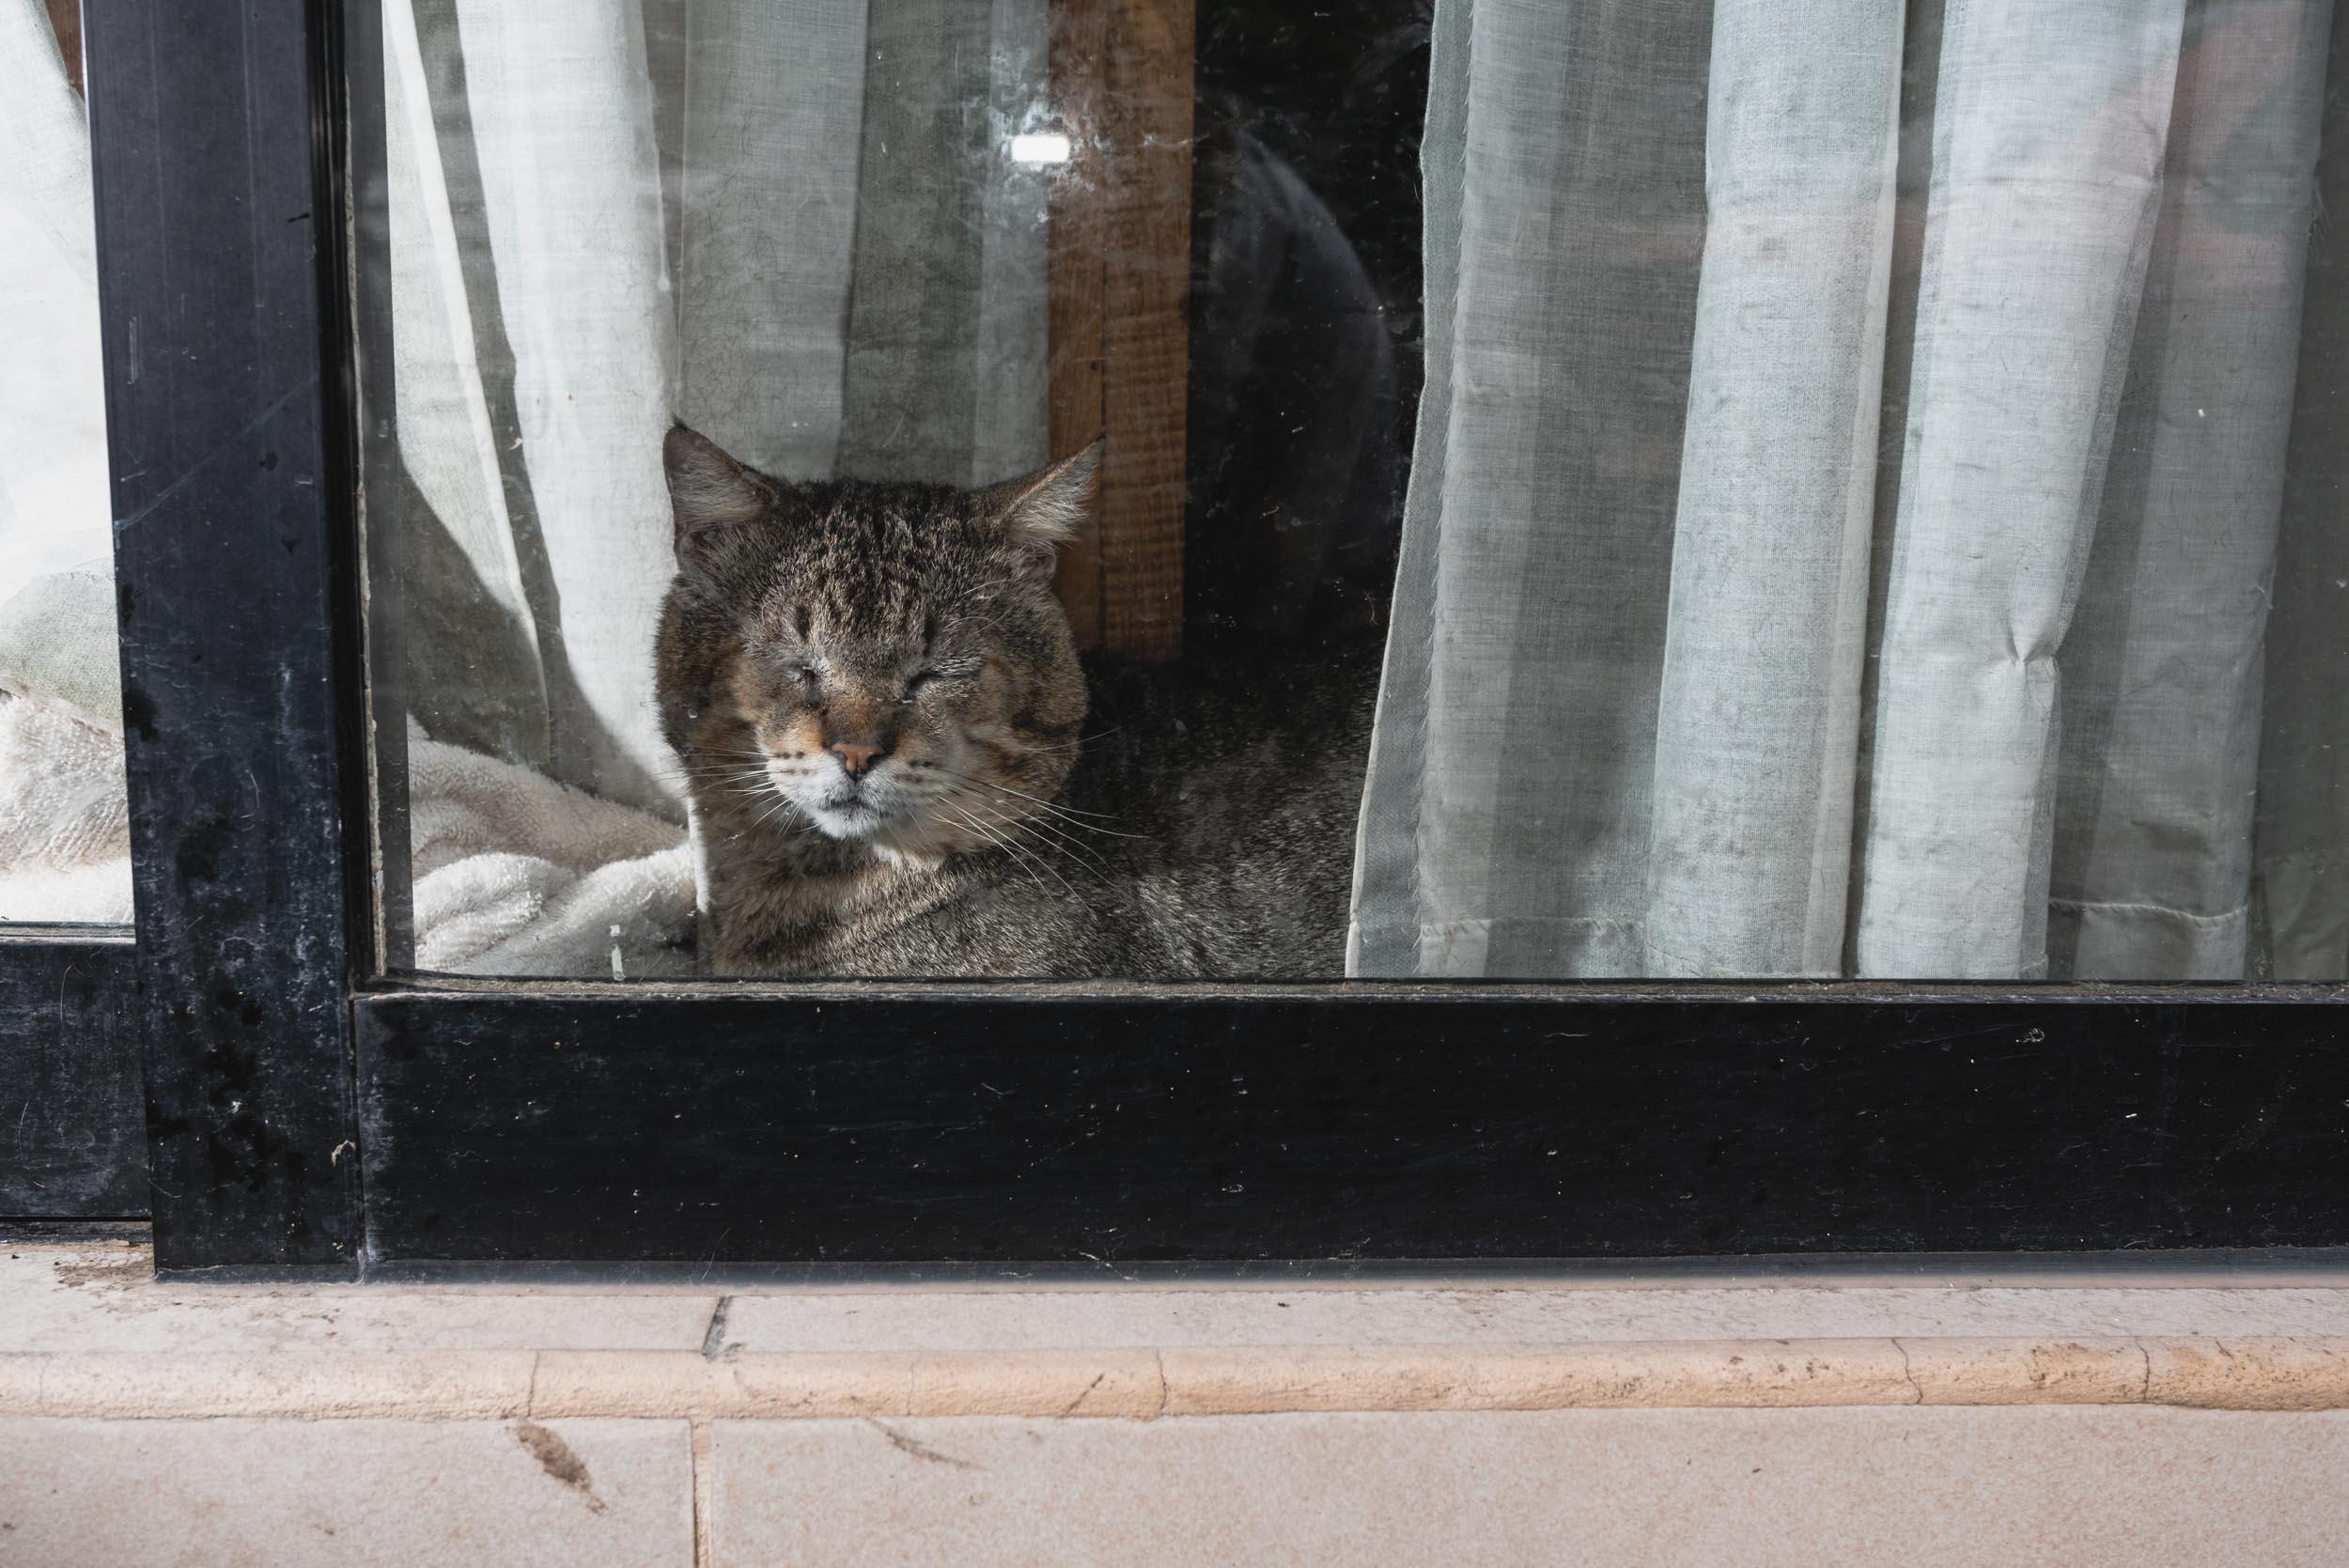 Puerto Vallarta cat in window